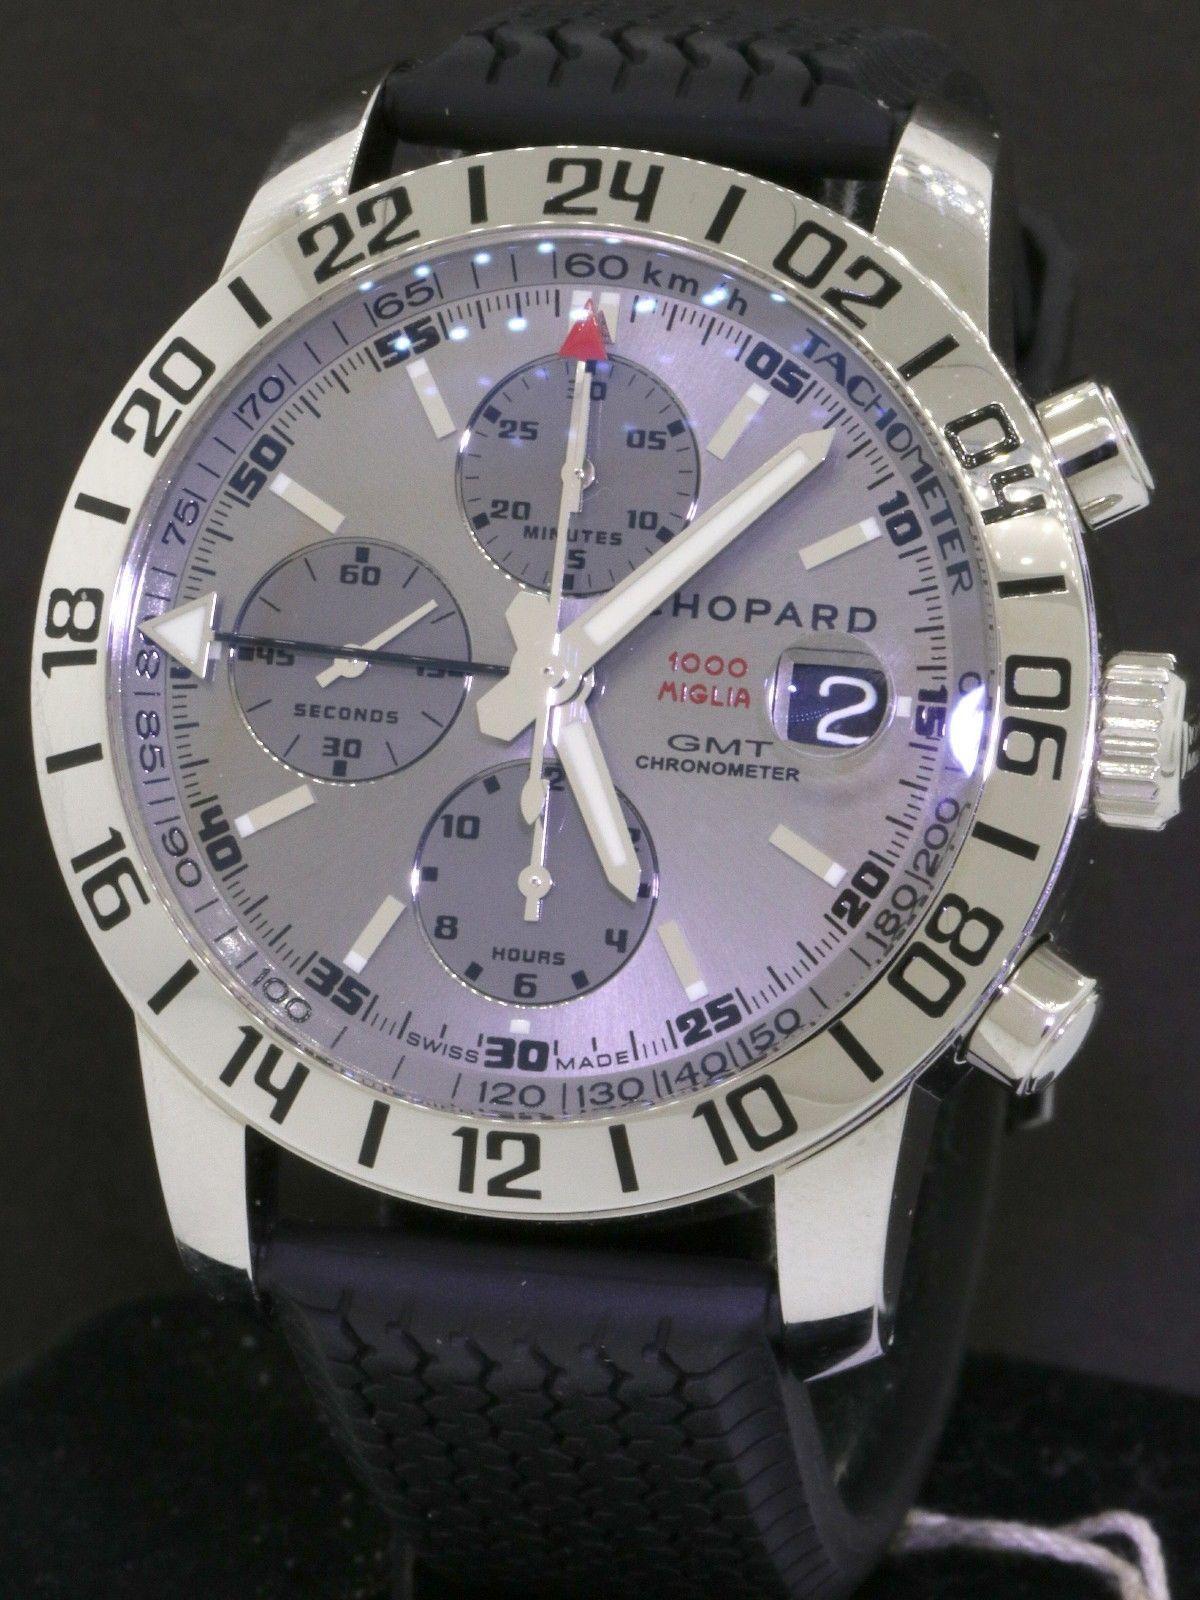 8237980936eeb Chopard Mille Miglia 1000 GMT 8992 SS automatic chronograph men's watch w/  B & P